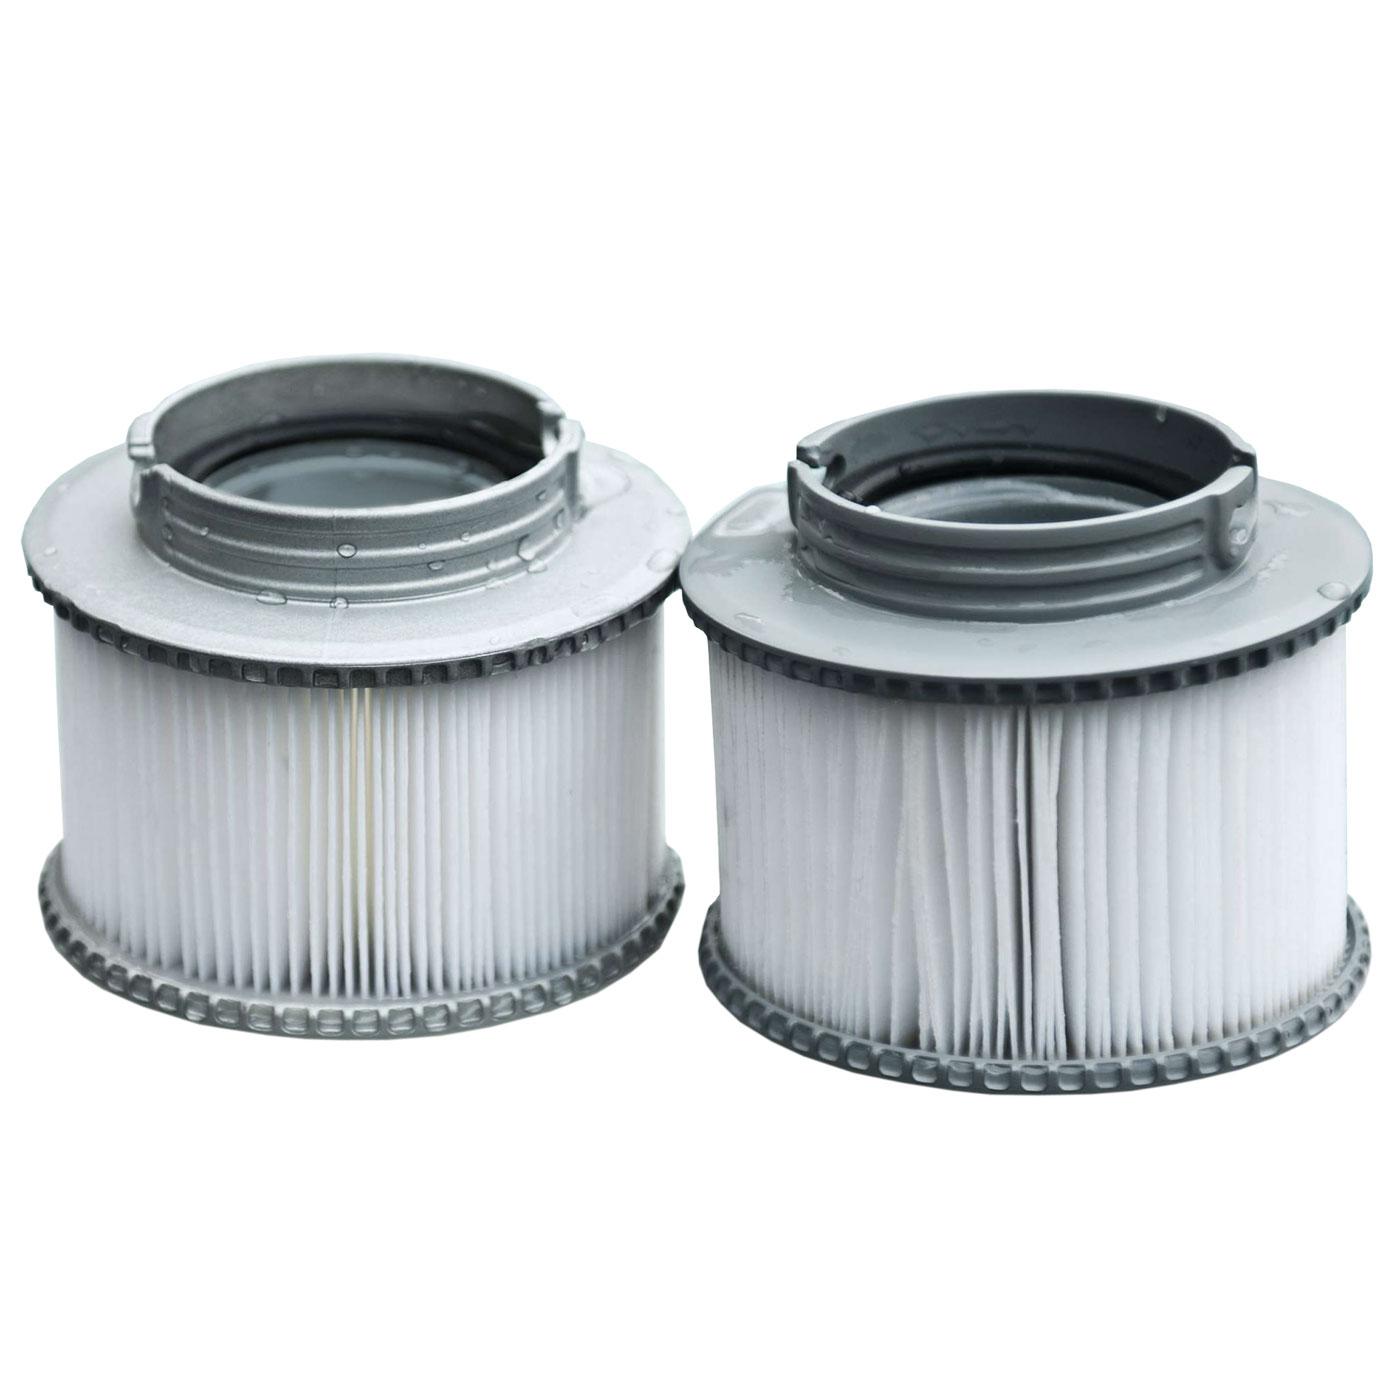 2x wasserfilter f r whirlpool mspa hwc a62 ersatzfilter filterkartusche zubeh r. Black Bedroom Furniture Sets. Home Design Ideas